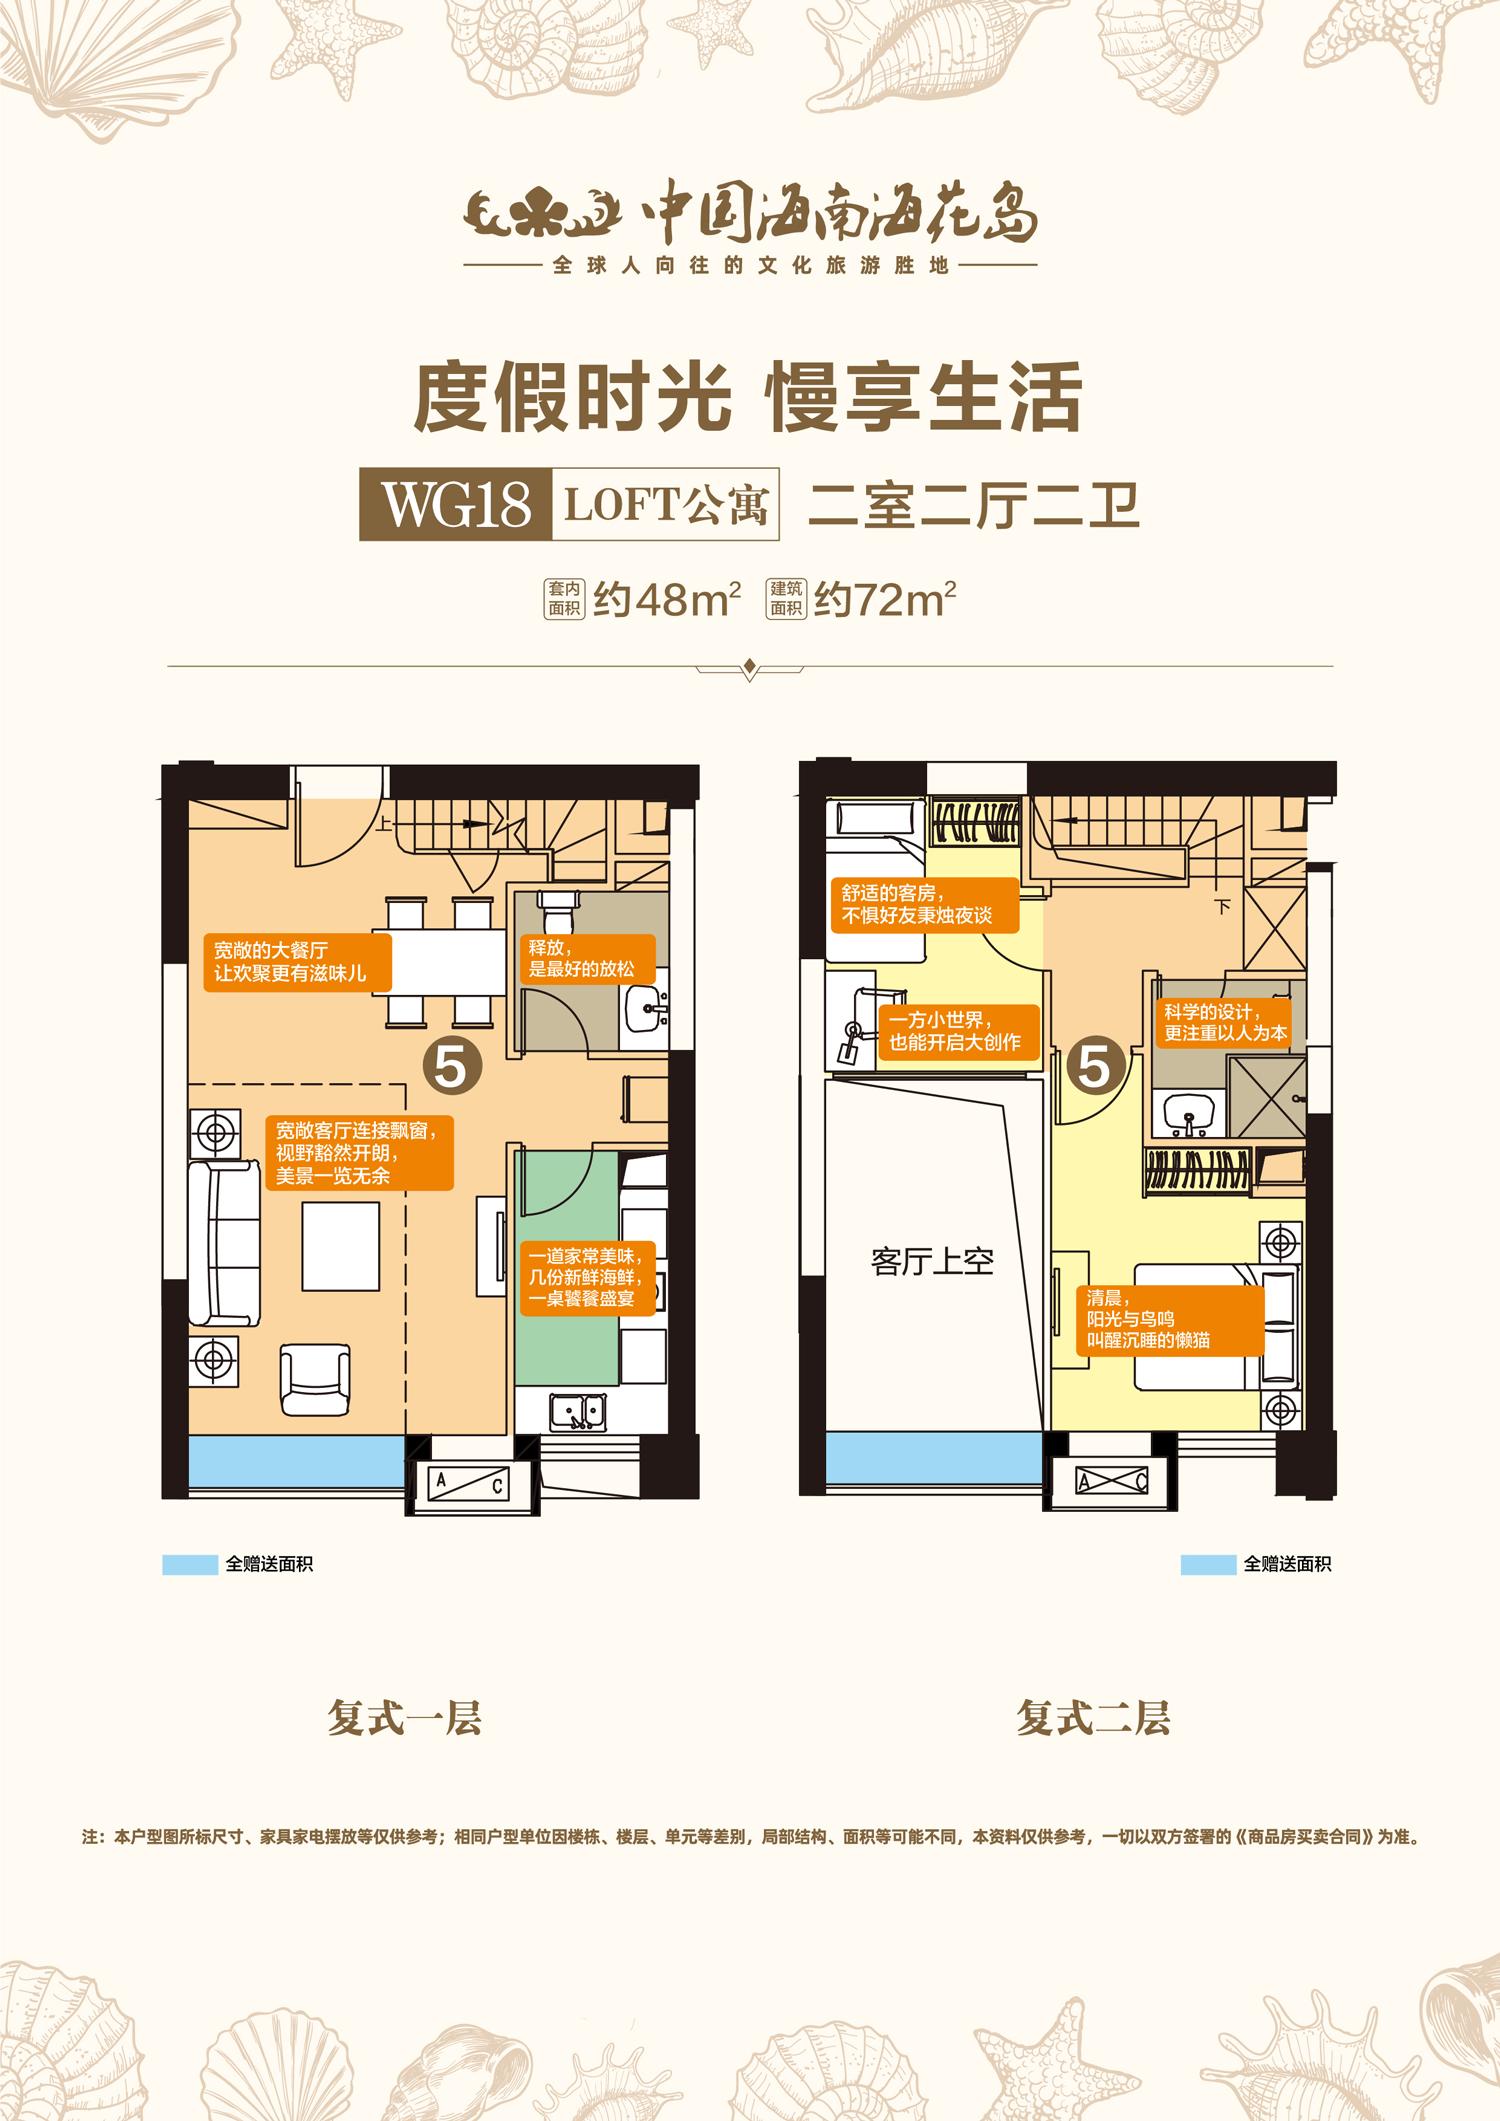 WG18LOFT公寓 2室2厅2卫 建面约48㎡、72㎡